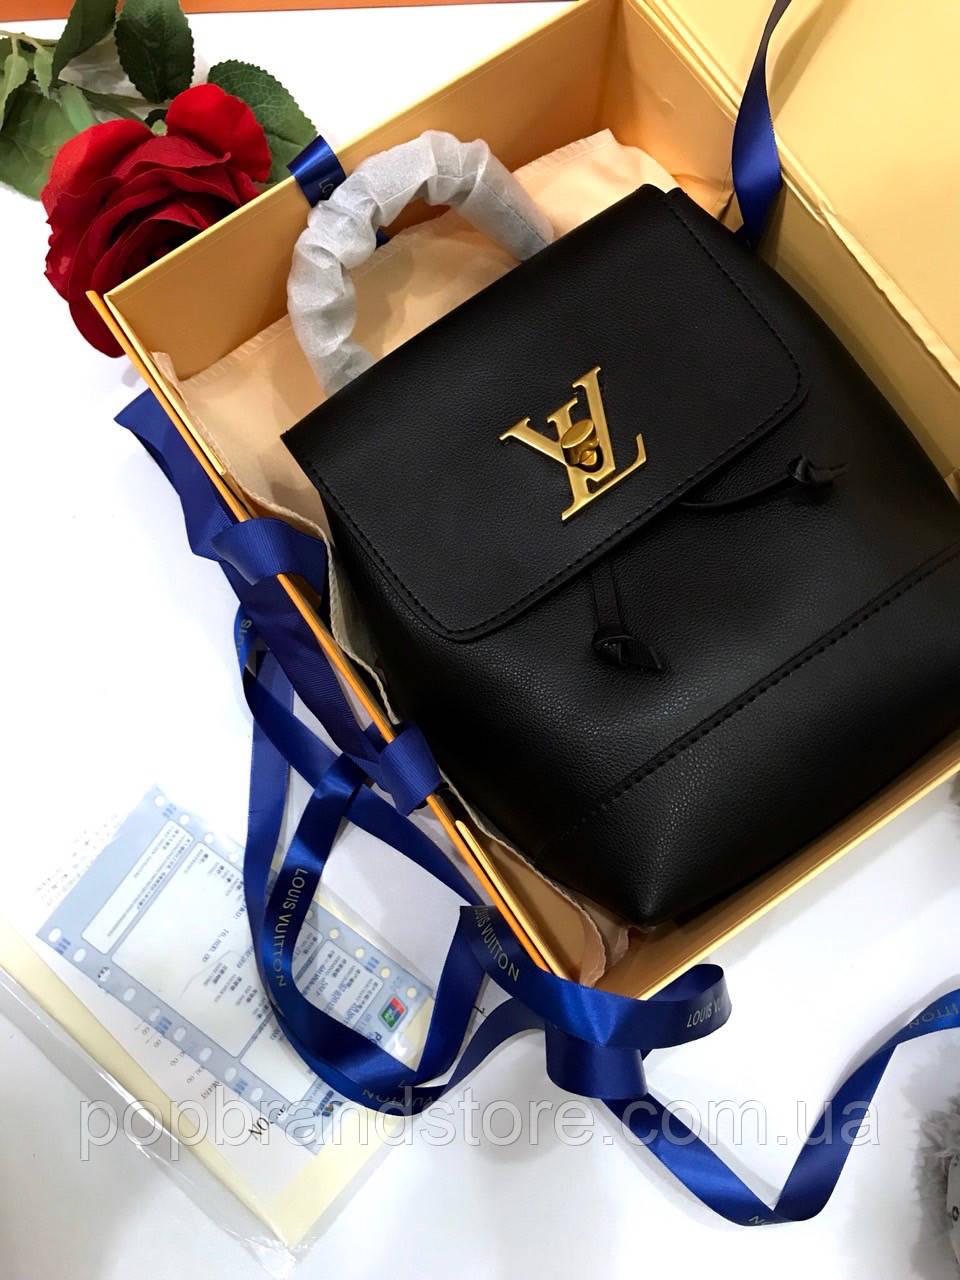 Крутой женский рюкзак Louis Vuitton LOCKME BACKPACK натуральная кожа  (реплика) 8a263c6d04a78